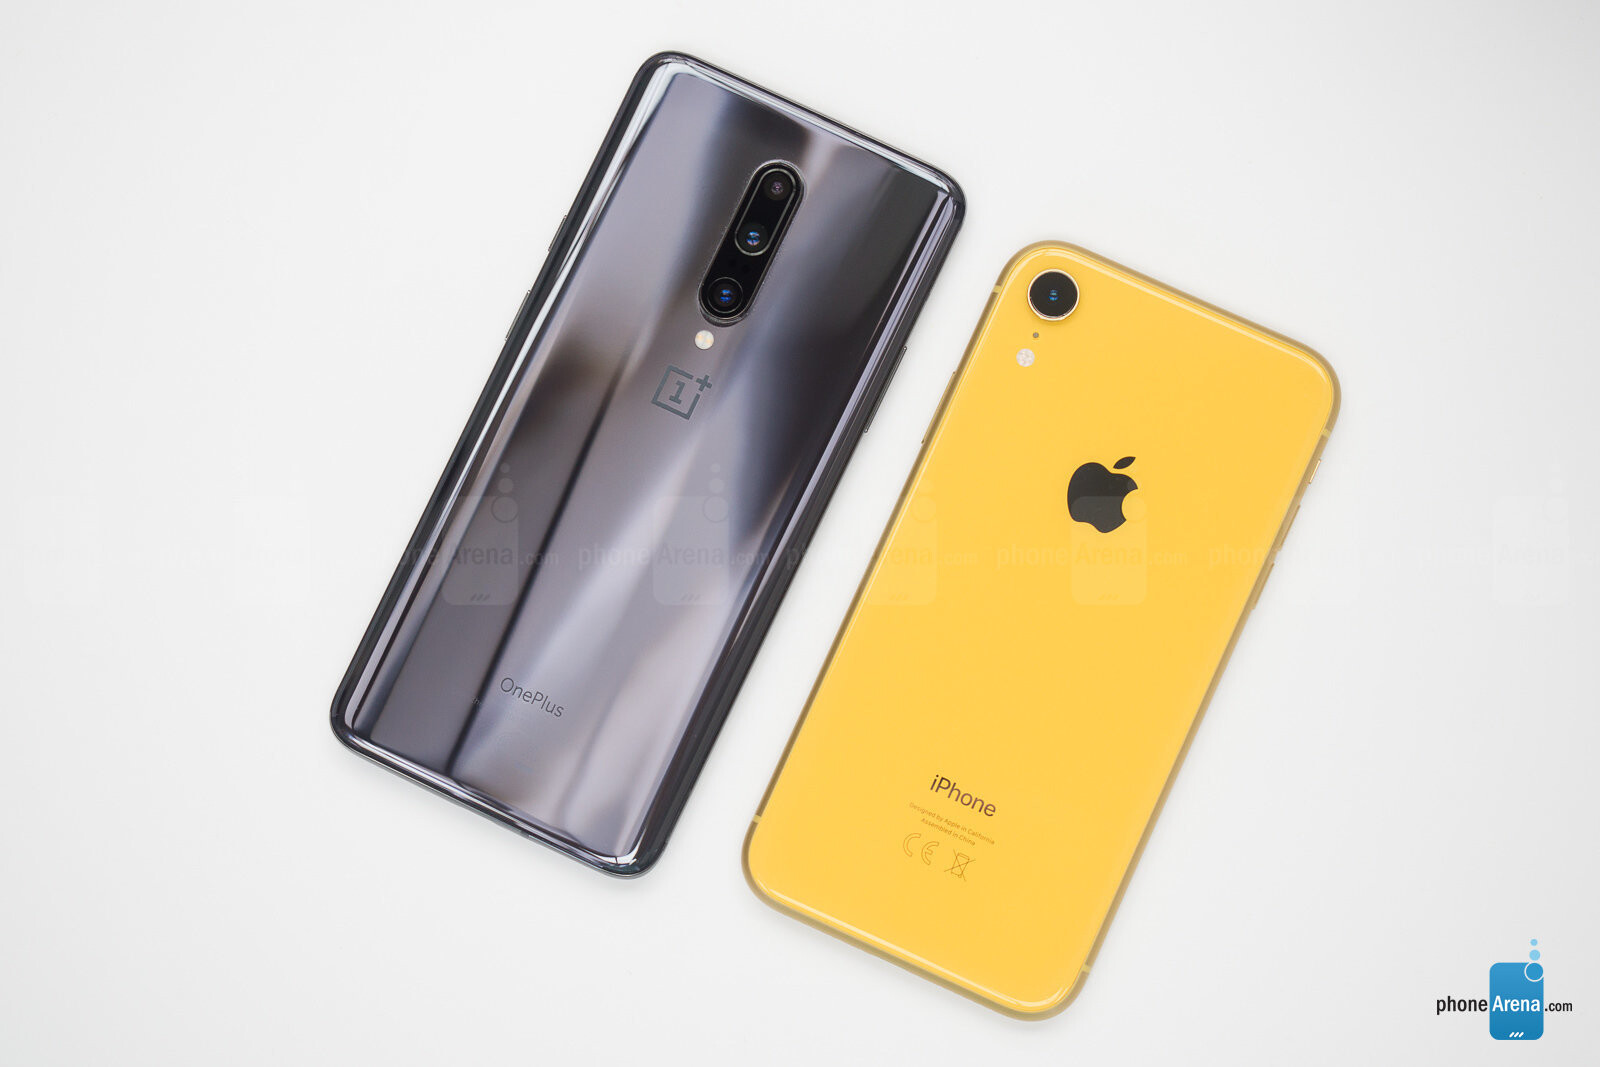 OnePlus 7 Pro vs Apple iPhone XR - PhoneArena